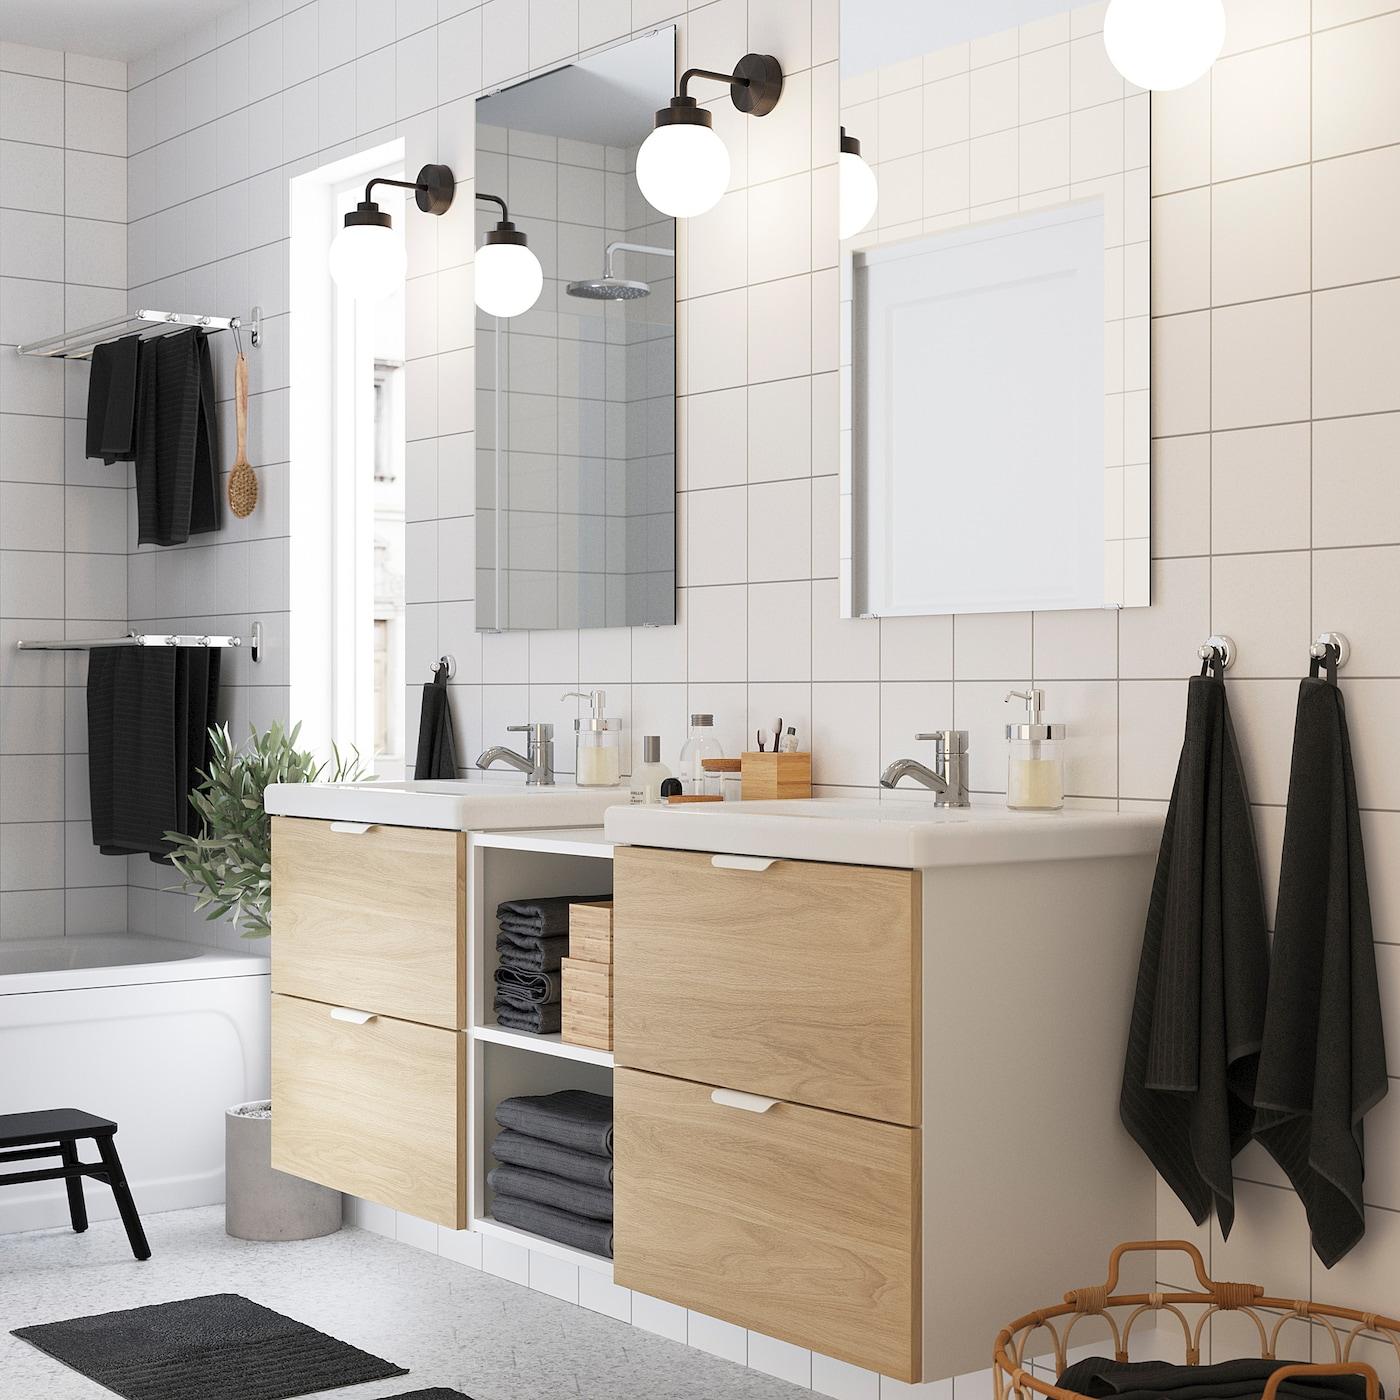 ENHET / TVÄLLEN Bathroom furniture, set of 15, oak effect/white Pilkån tap, 164x43x65 cm